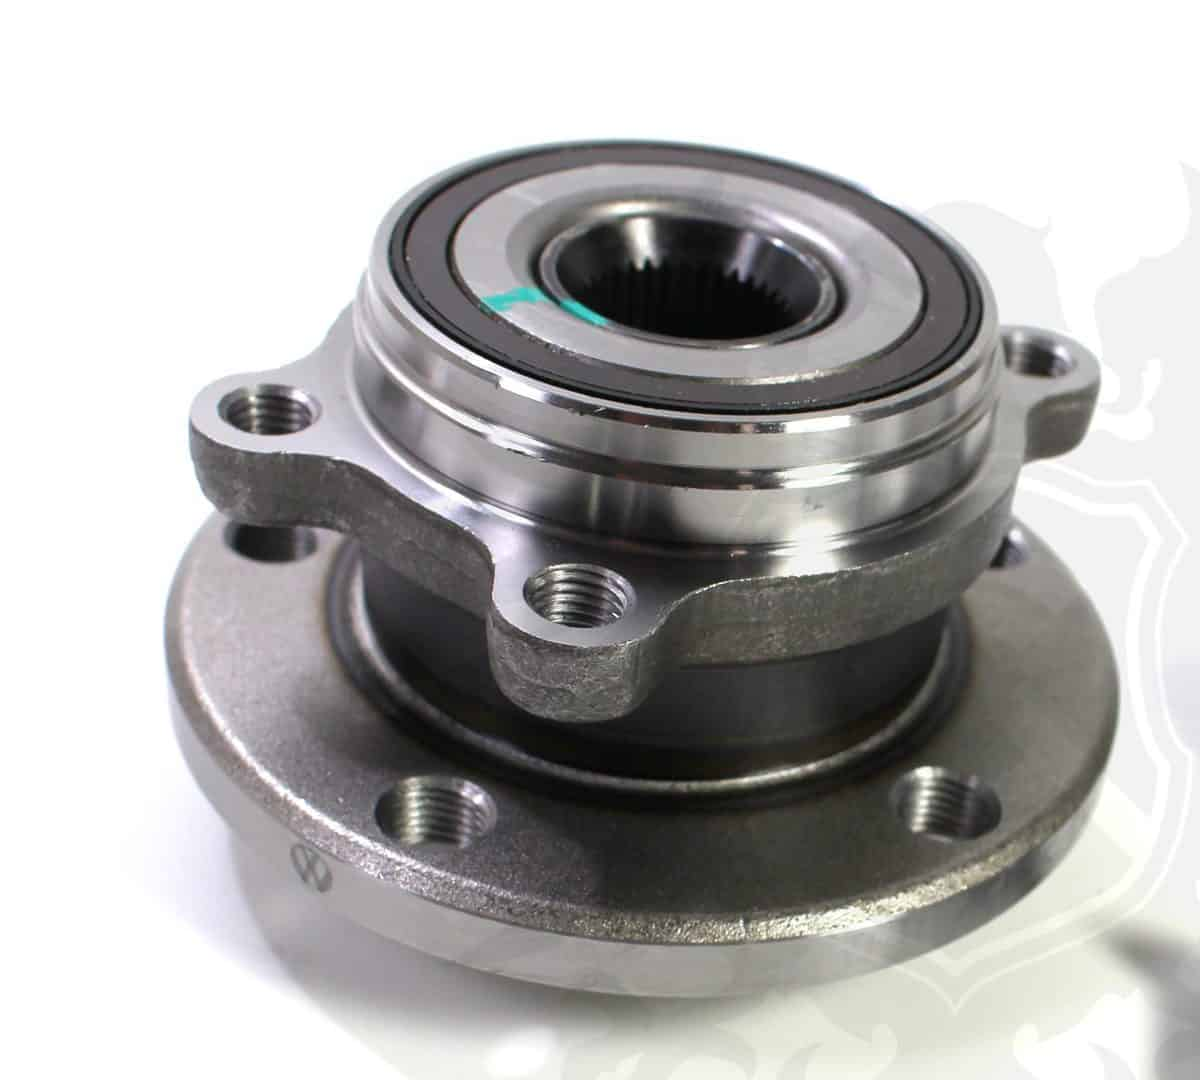 2014 vw jetta rear wheel bearing replacement